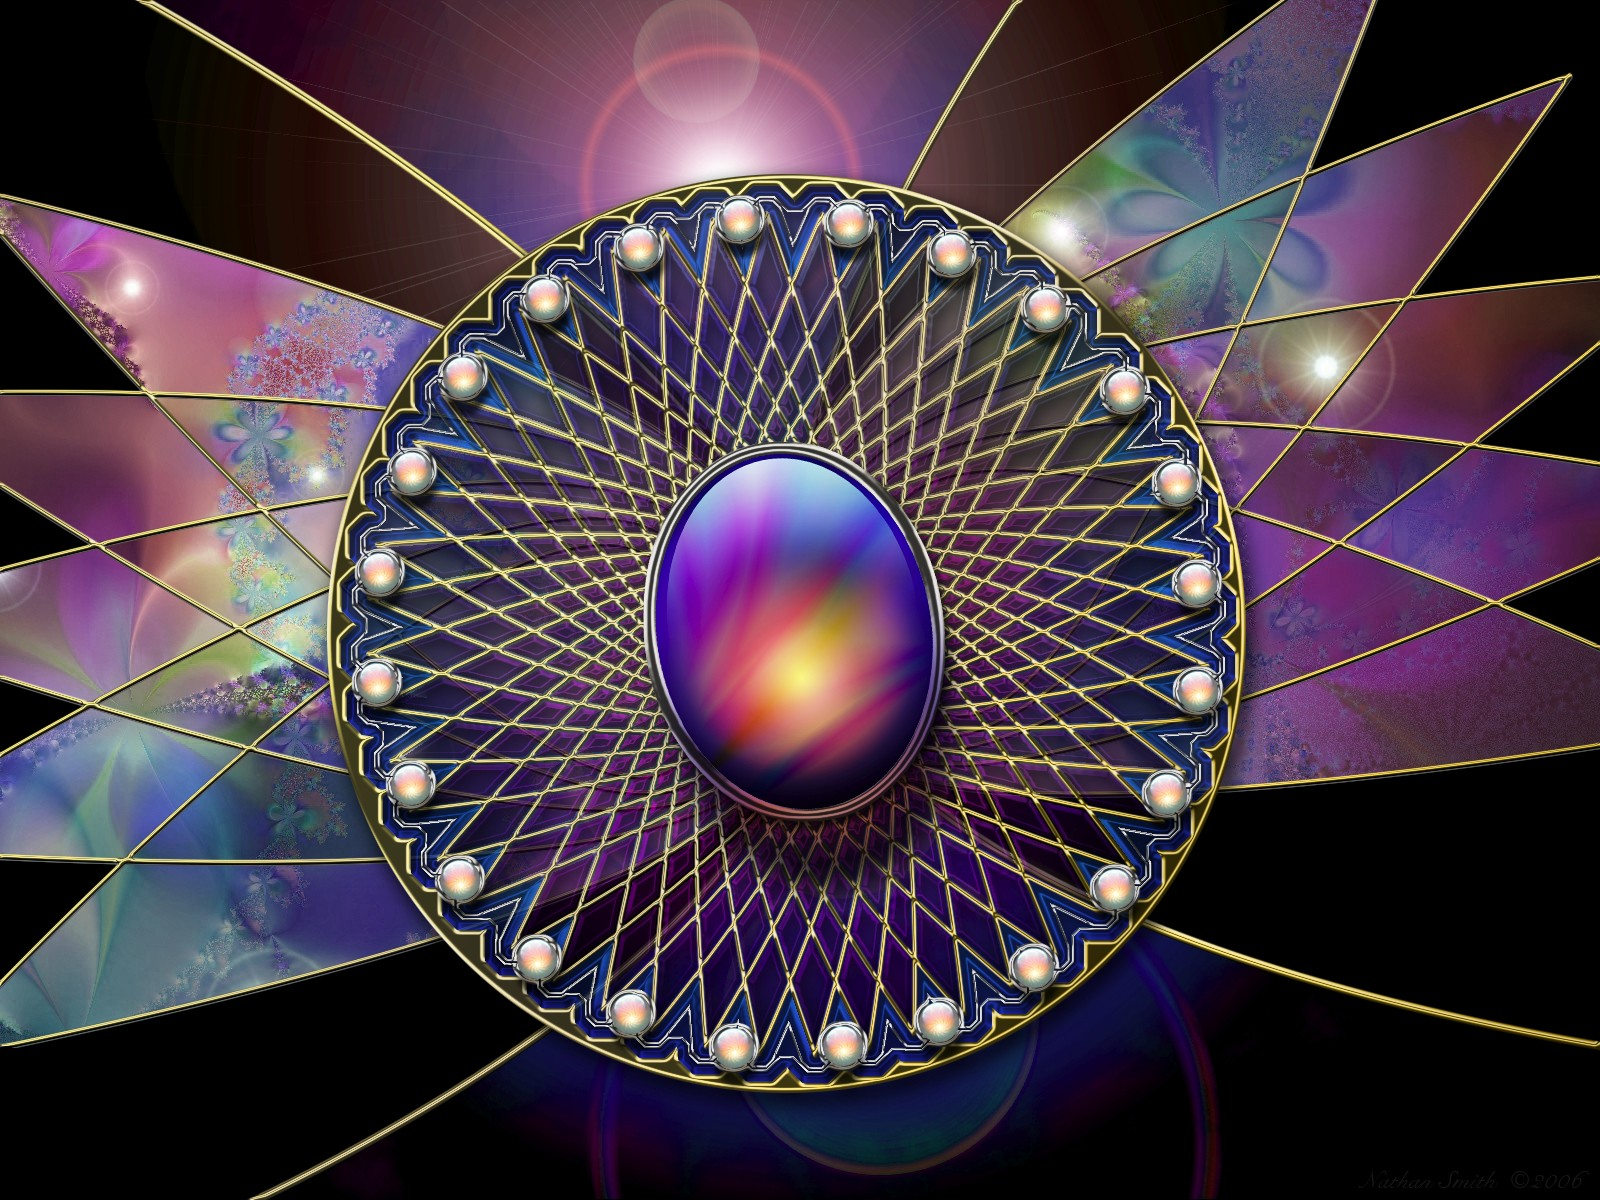 http://1.bp.blogspot.com/-woojNhe8Shc/T-TN6tiOxII/AAAAAAAAF6Q/KRPR9zYEry8/s1600/fractal+art+wallpapers+free+in+3d--3.jpg